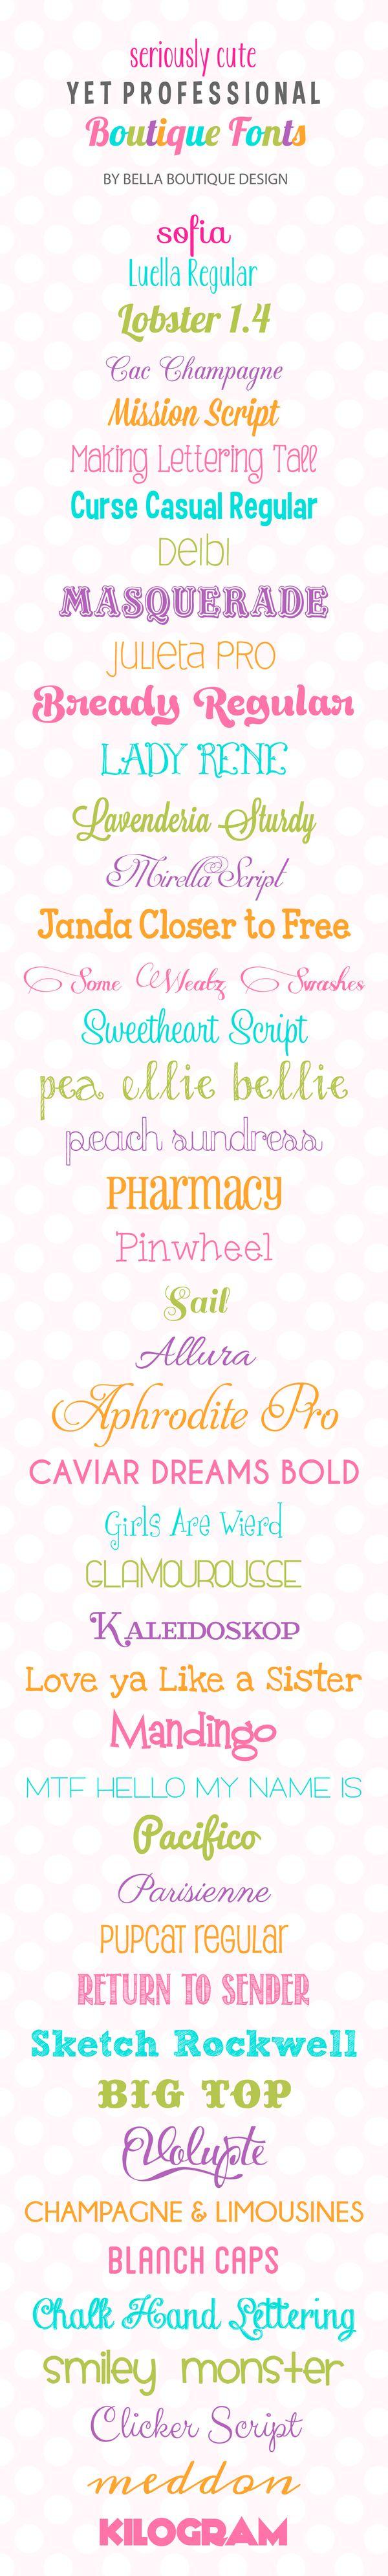 Pin by Janenisa รักในหลวง on Favorite Font Typography